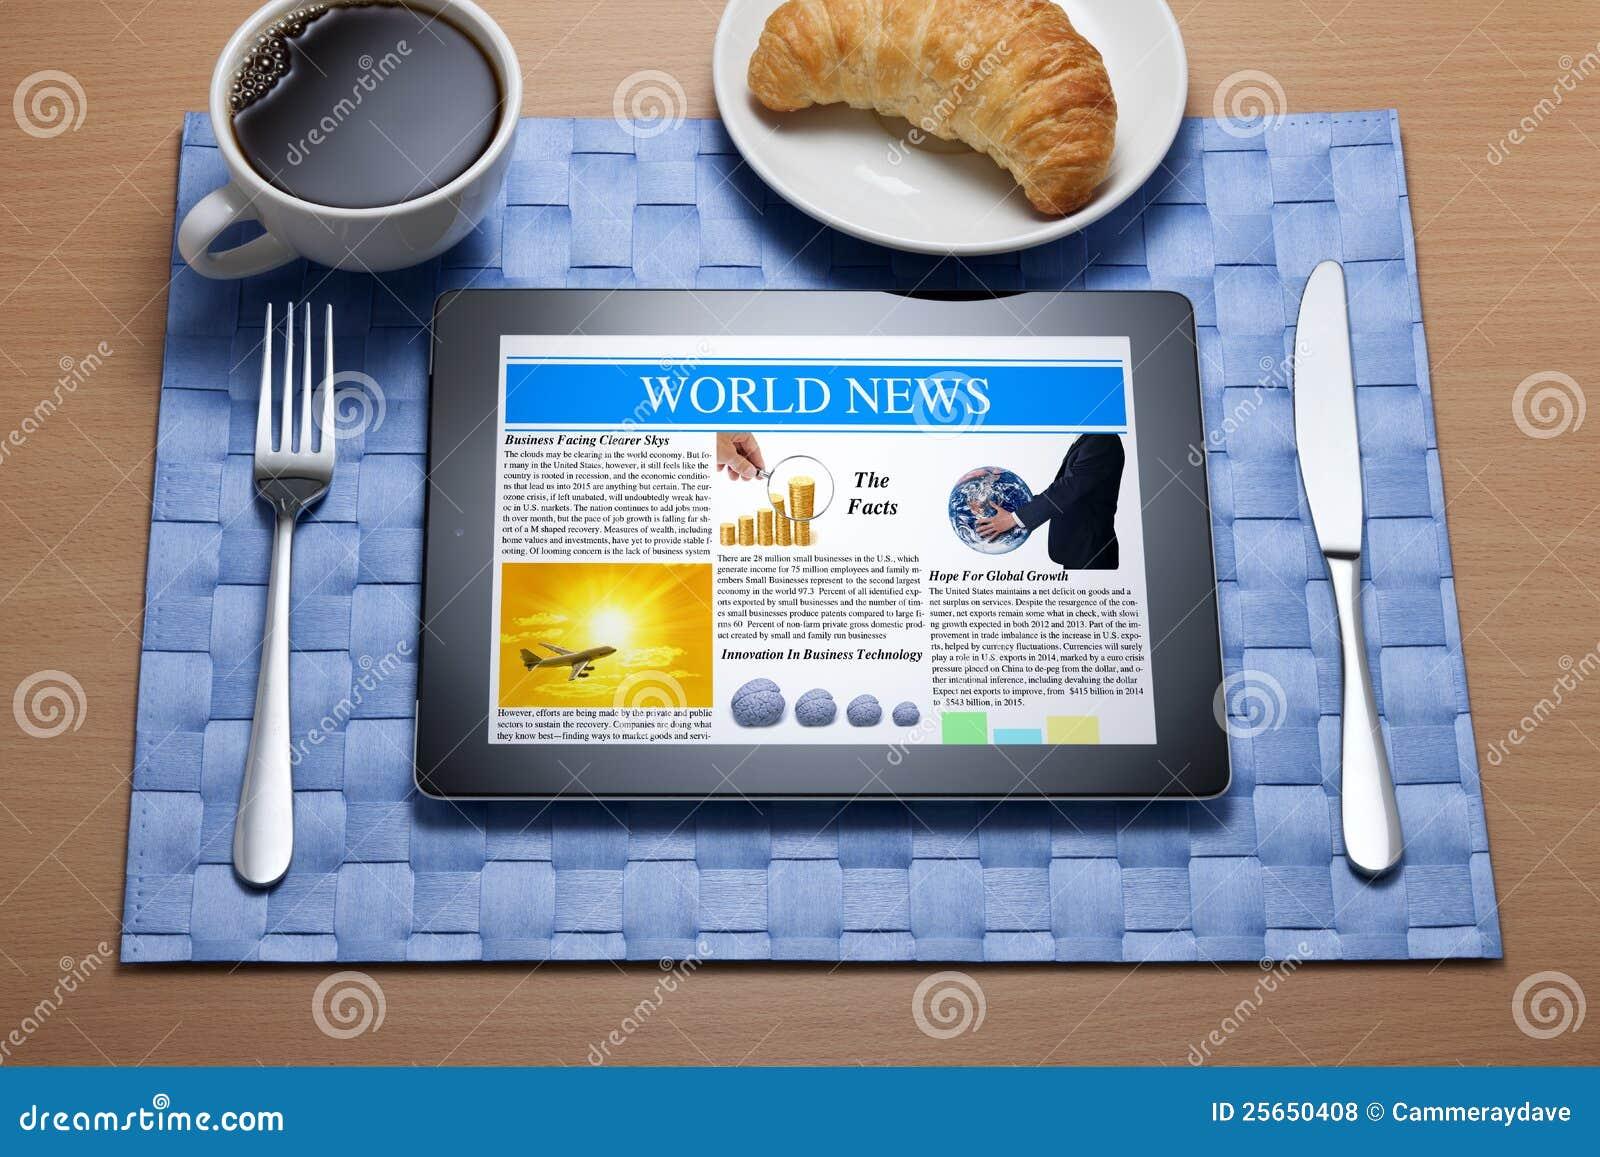 Ipad Tablet Online Breakfast Newspaper Royalty Free Stock Photos Image 25650408